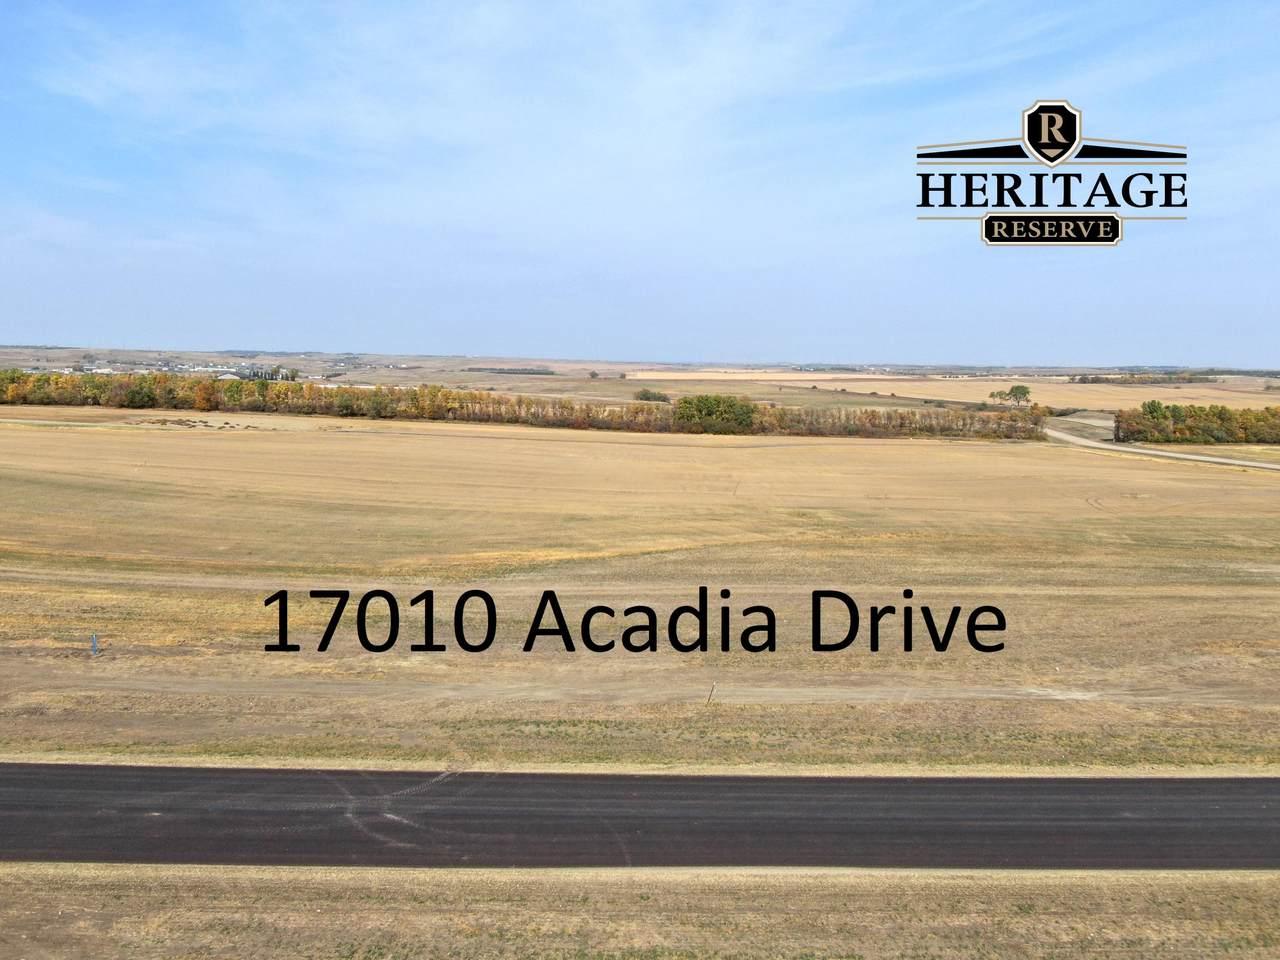 17010 Acadia Drive - Photo 1